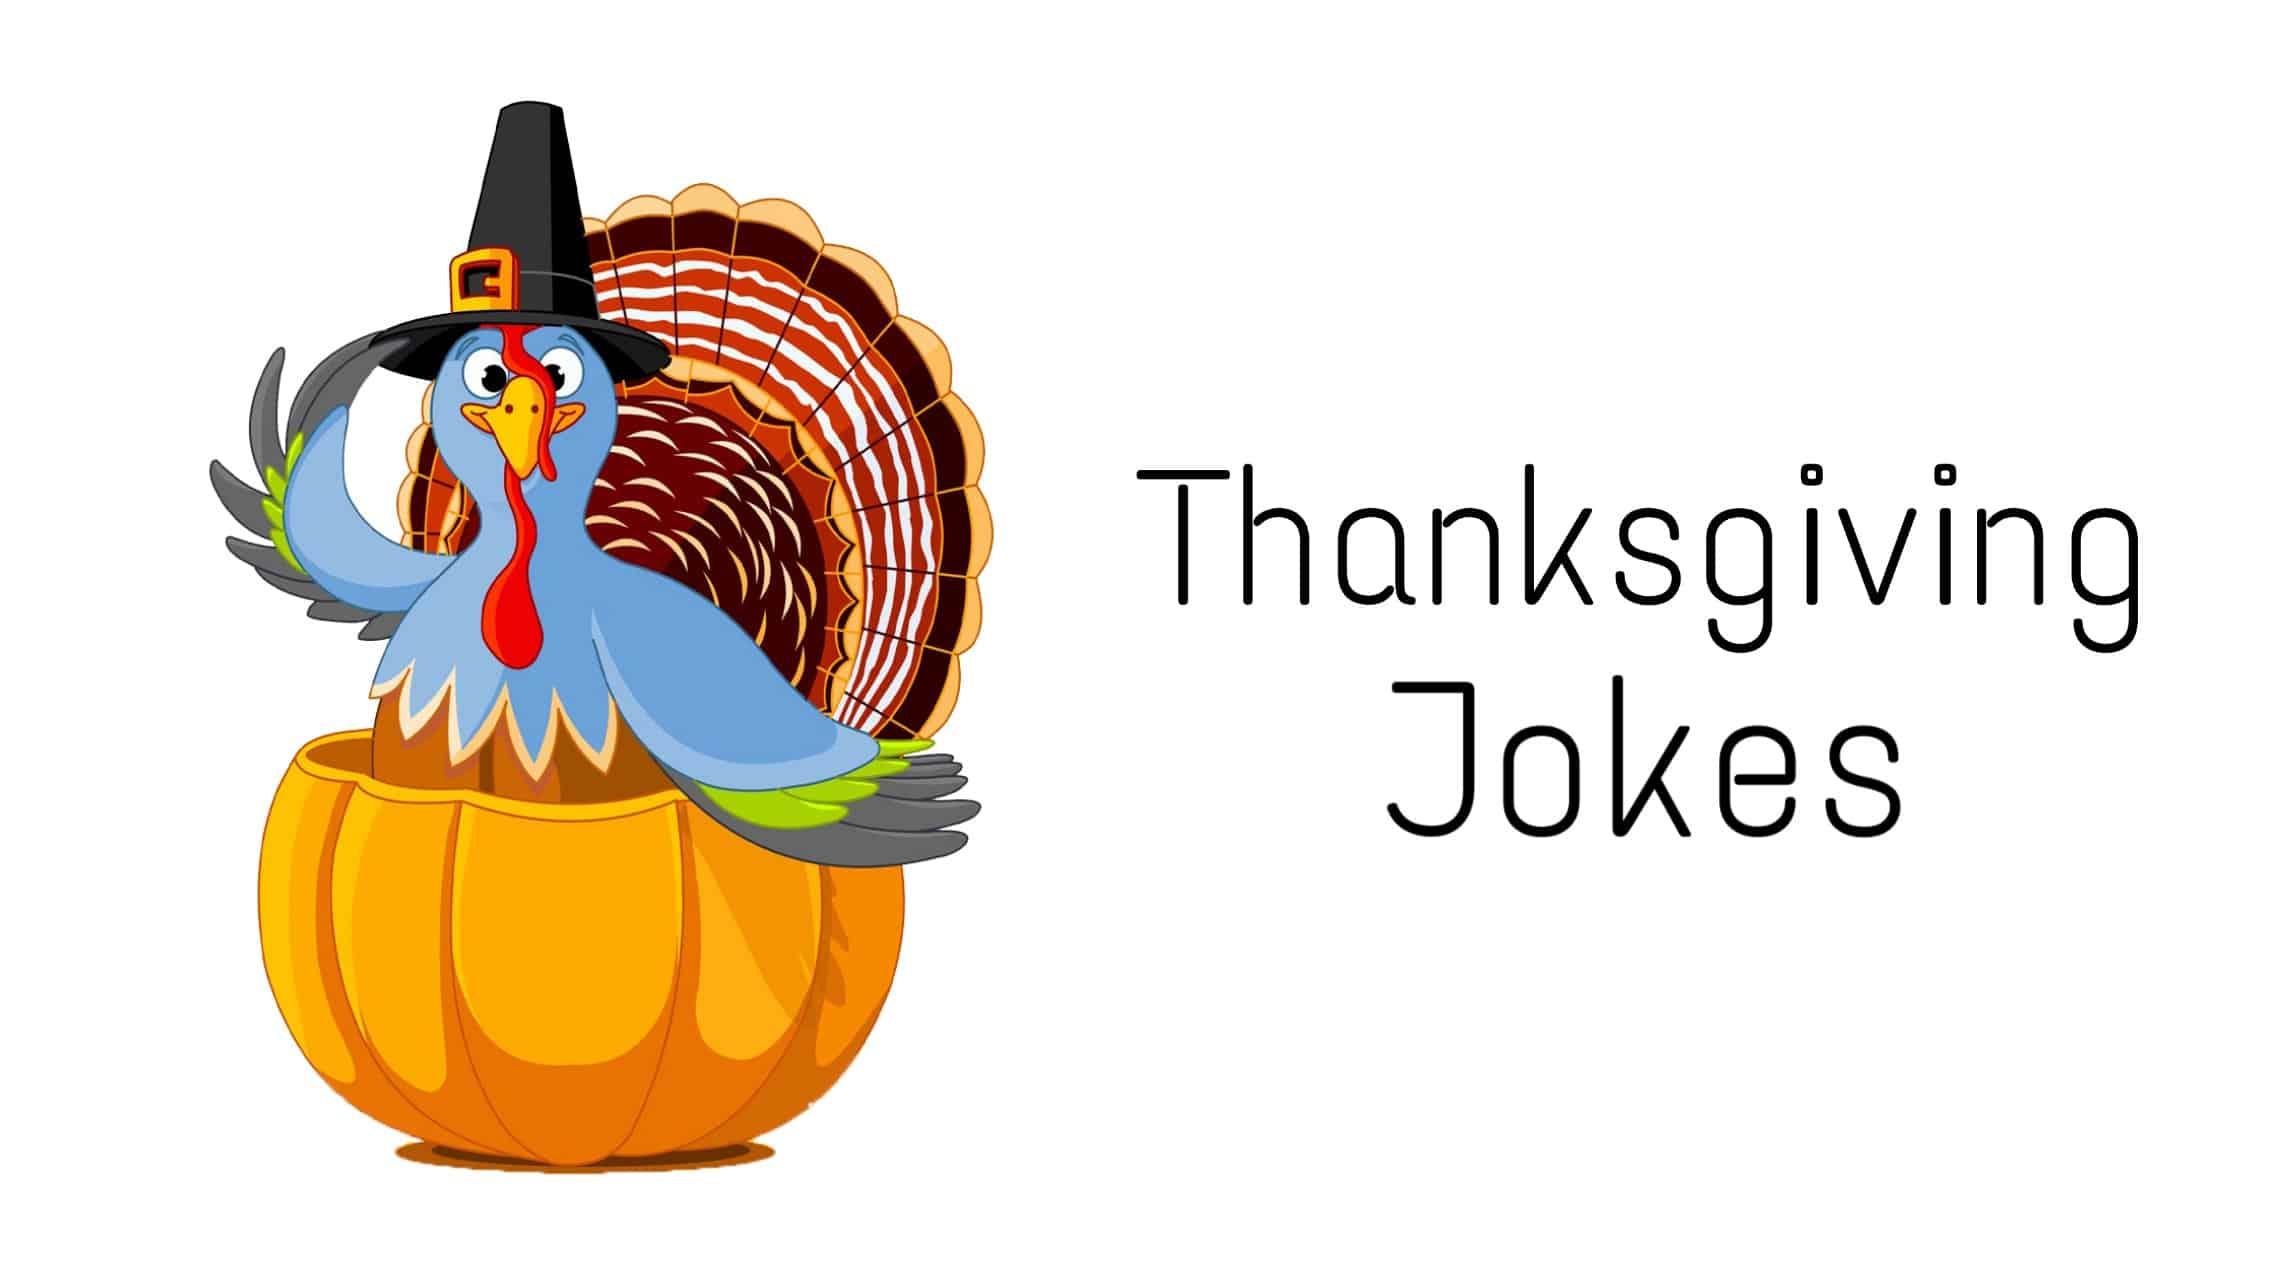 Thanksgiving jokes for kids are Plucking Hilarious